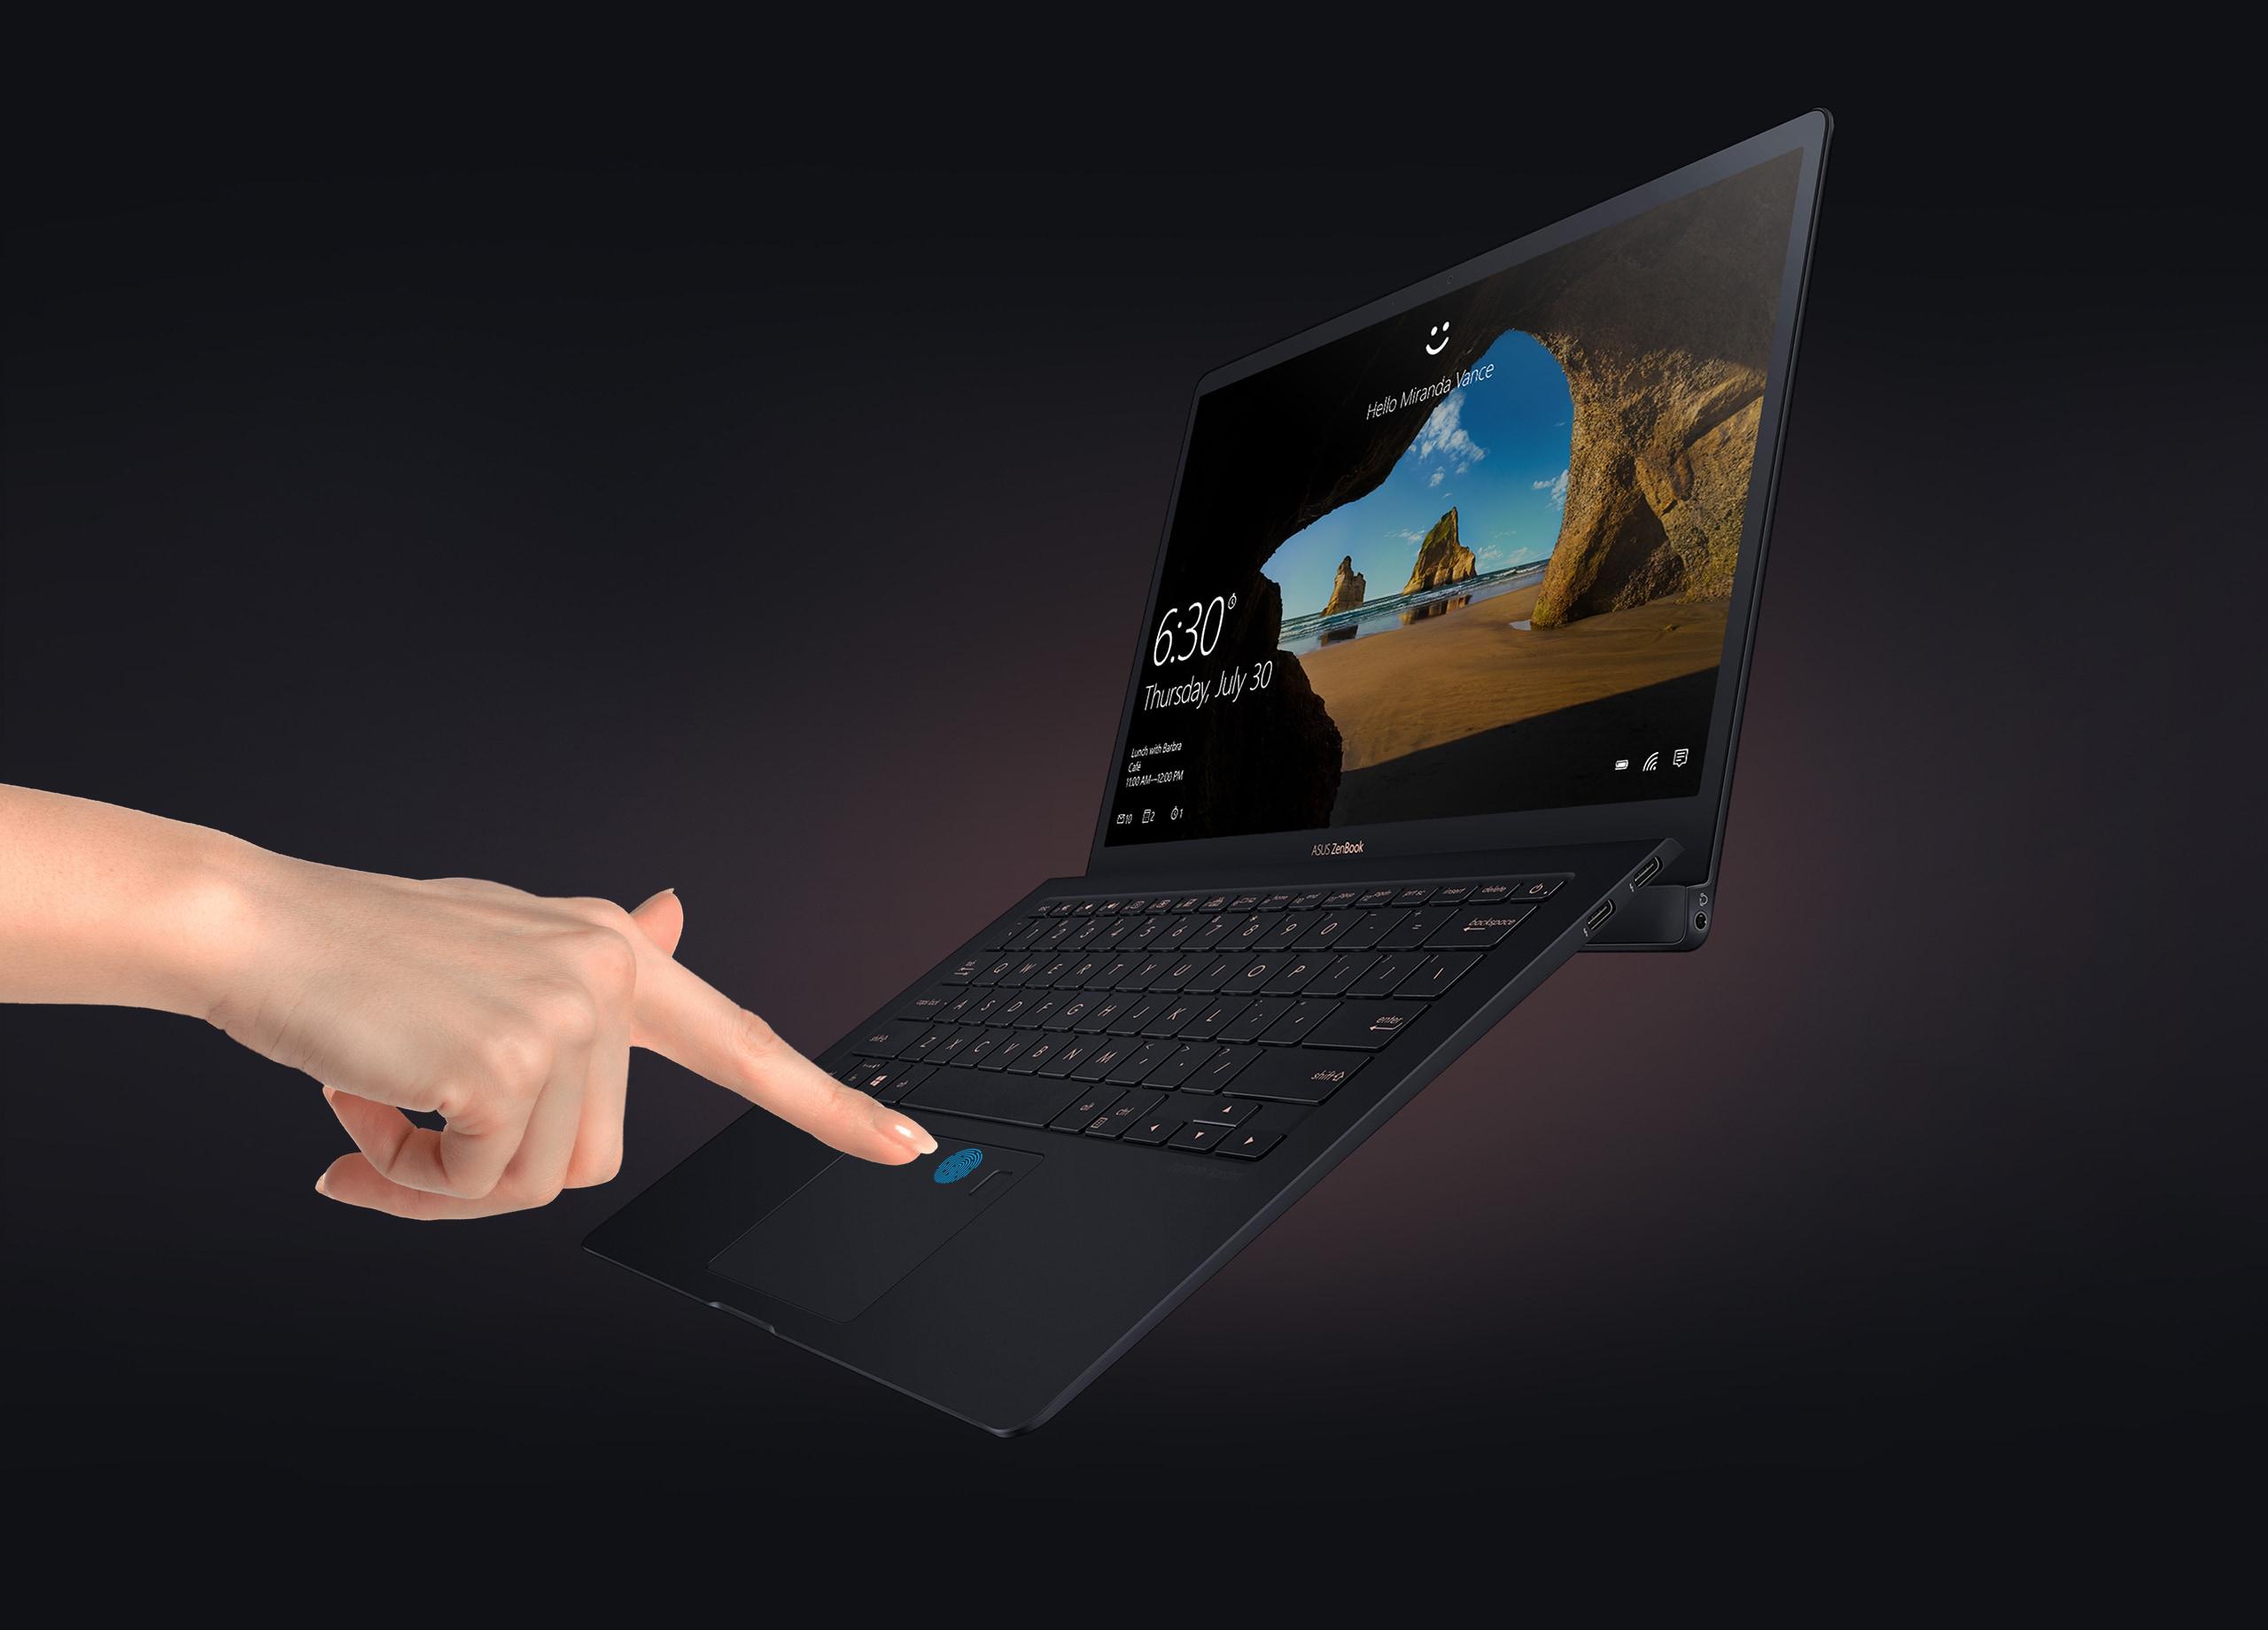 ASUS ZenBook S UX391FA XH74T - 13 3%22 - Core i7 8565U - 16 GB RAM - 512 GB  SSD